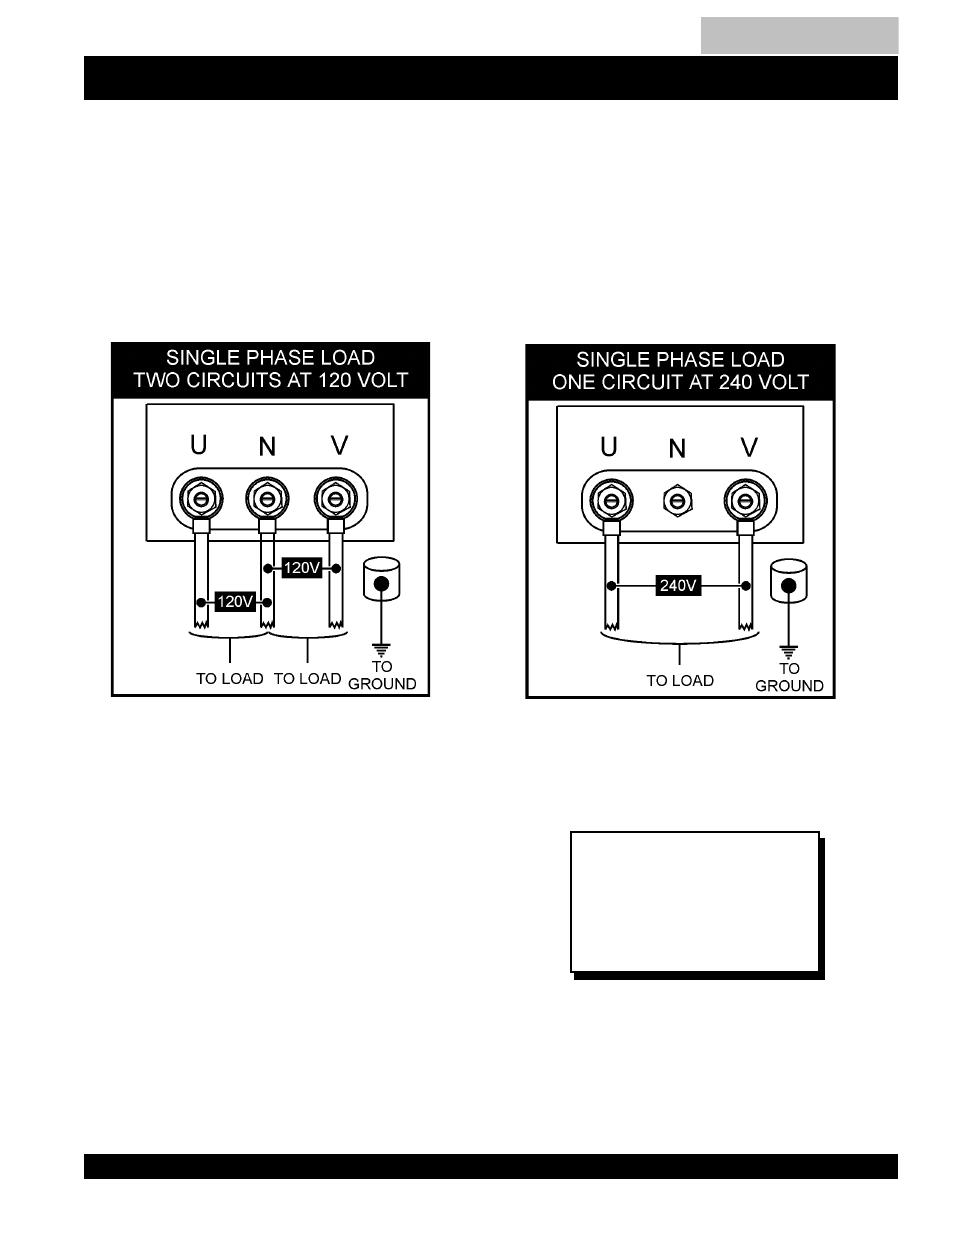 Multiquip Mq Power Duelweld Welder Ac Generator Blw 400ssw User Welding Circuit Diagram Manual Page 25